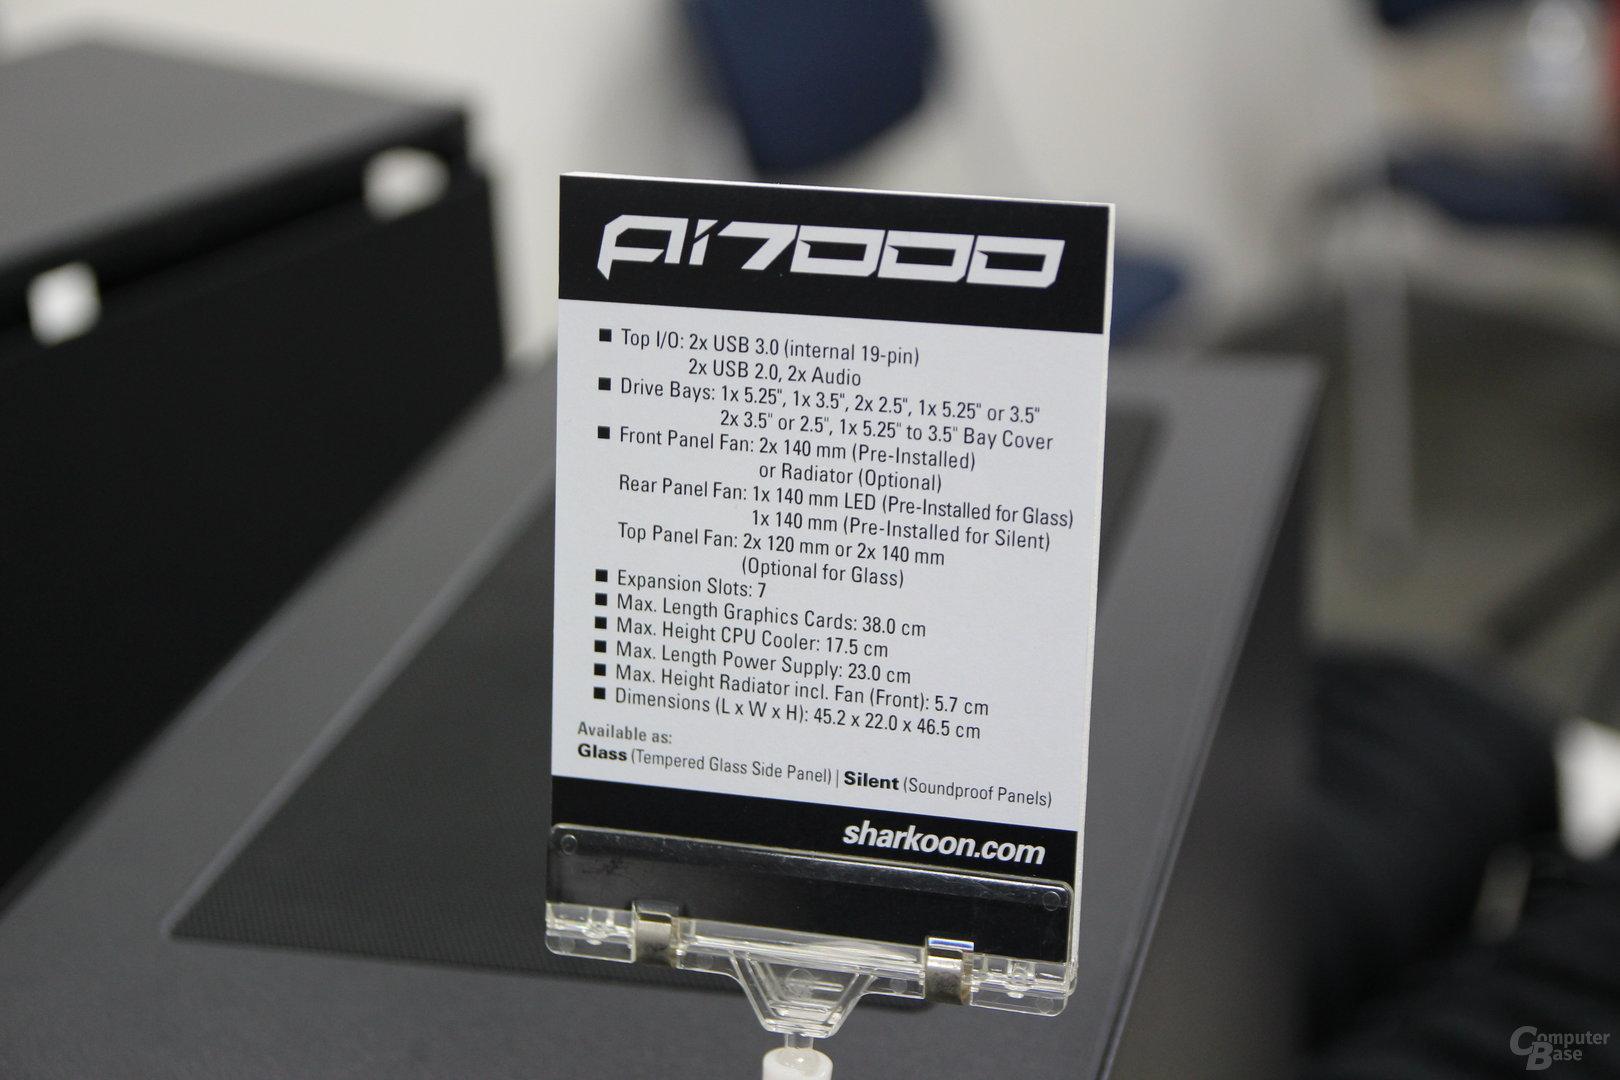 Sharkoon AI7000